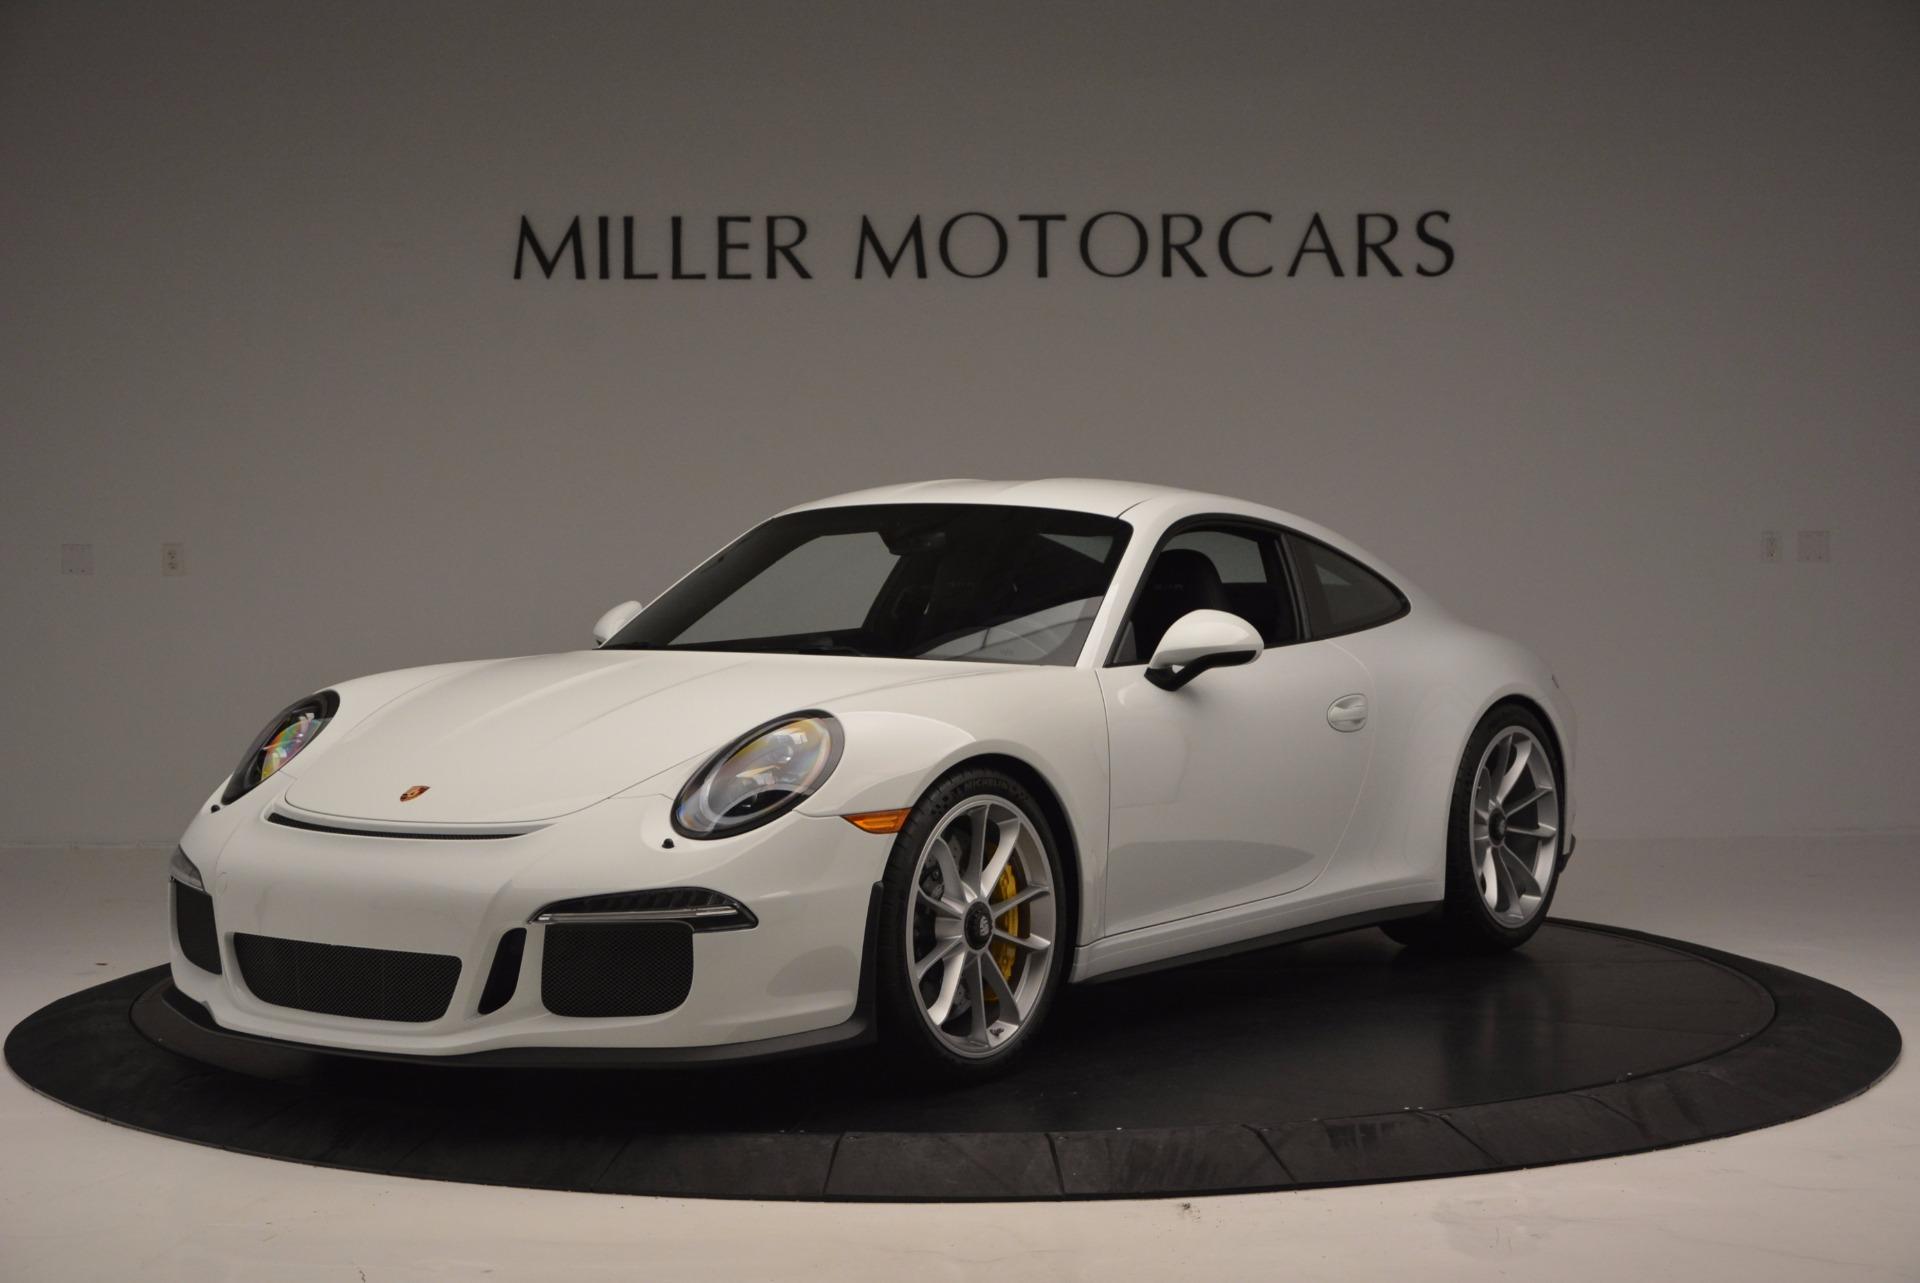 Used 2016 Porsche 911 R for sale Sold at Alfa Romeo of Westport in Westport CT 06880 1